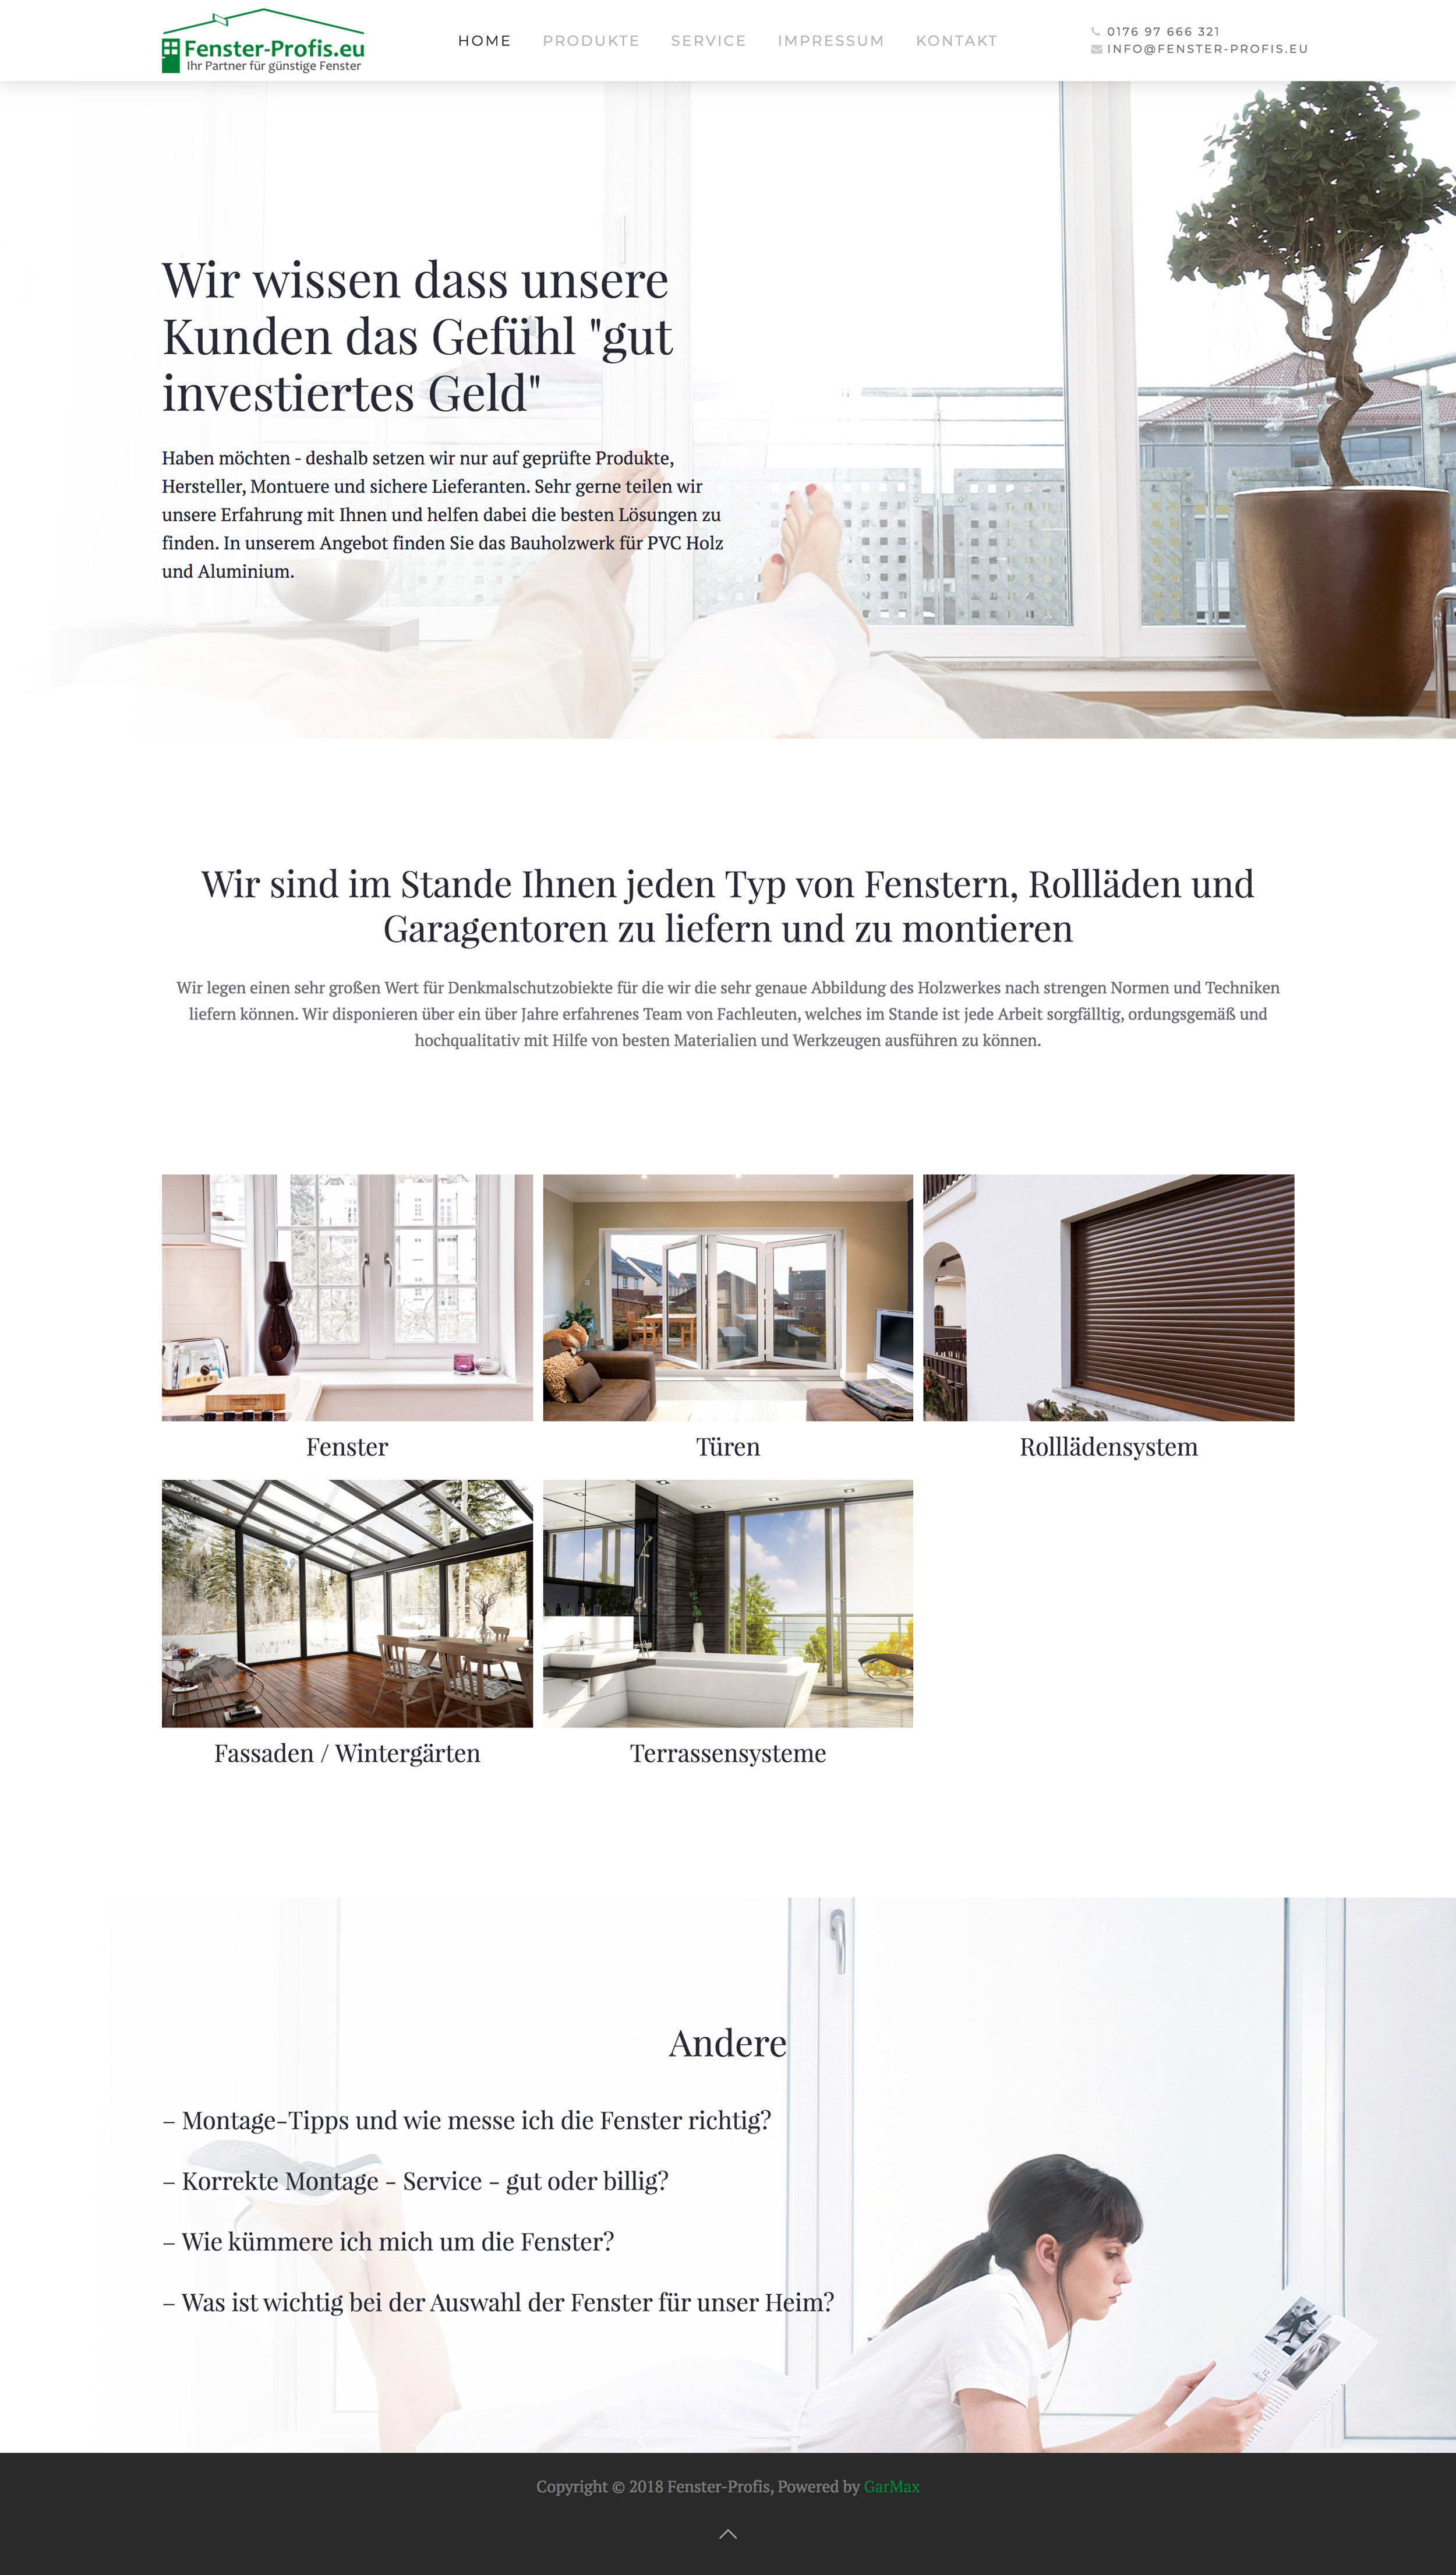 Fenster-Profis - Home